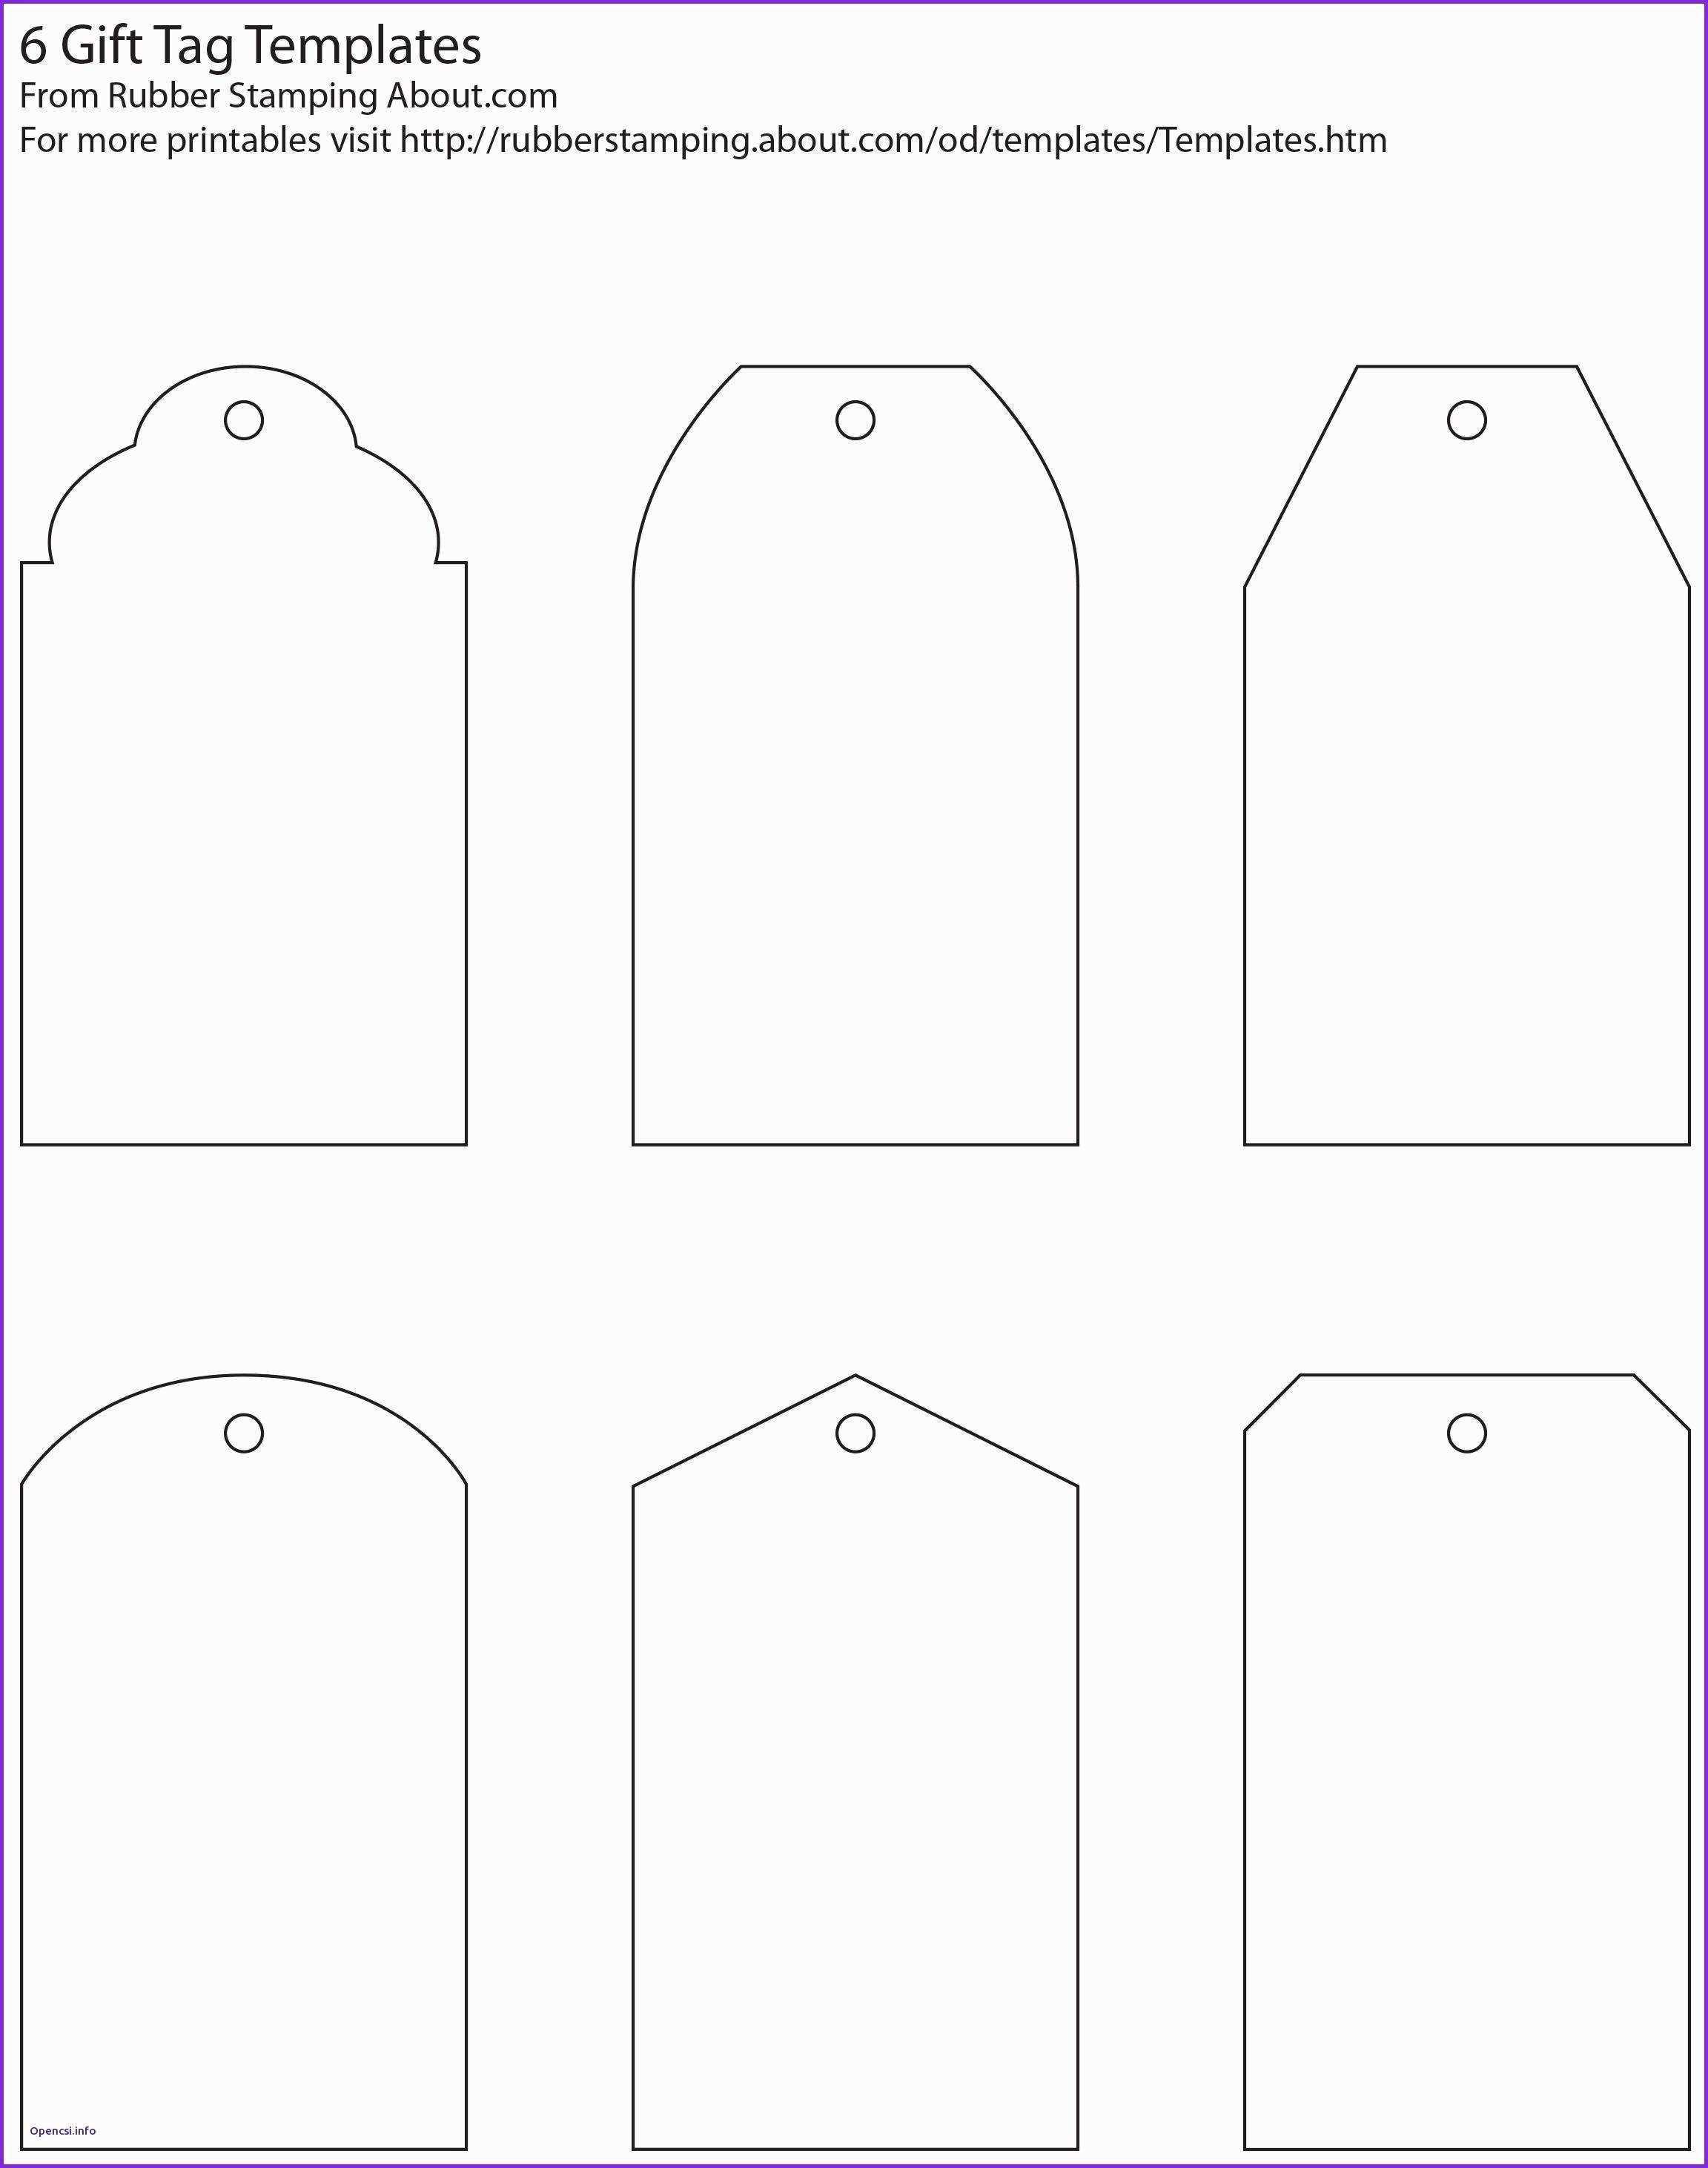 37 Adding Free Printable Quarter Fold Card Template Layouts By Free Printable Quarter Fold Card Template Cards Design Templates